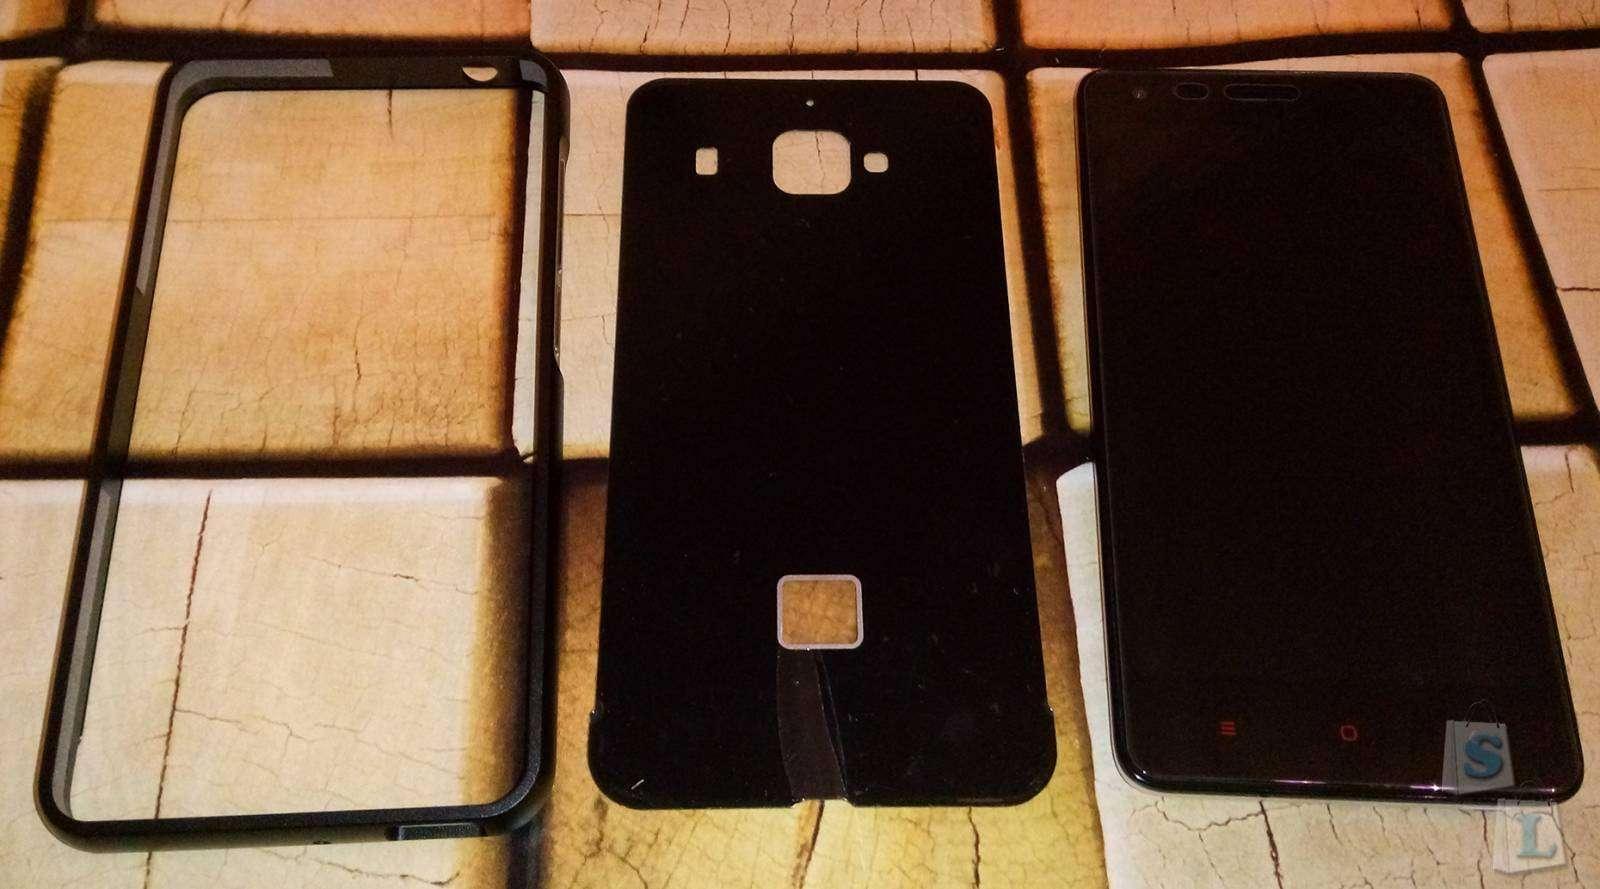 GearBest: Полная защита смартфона - Защитное стекло и чехол для  Xiaomi Redmi 2 Pro